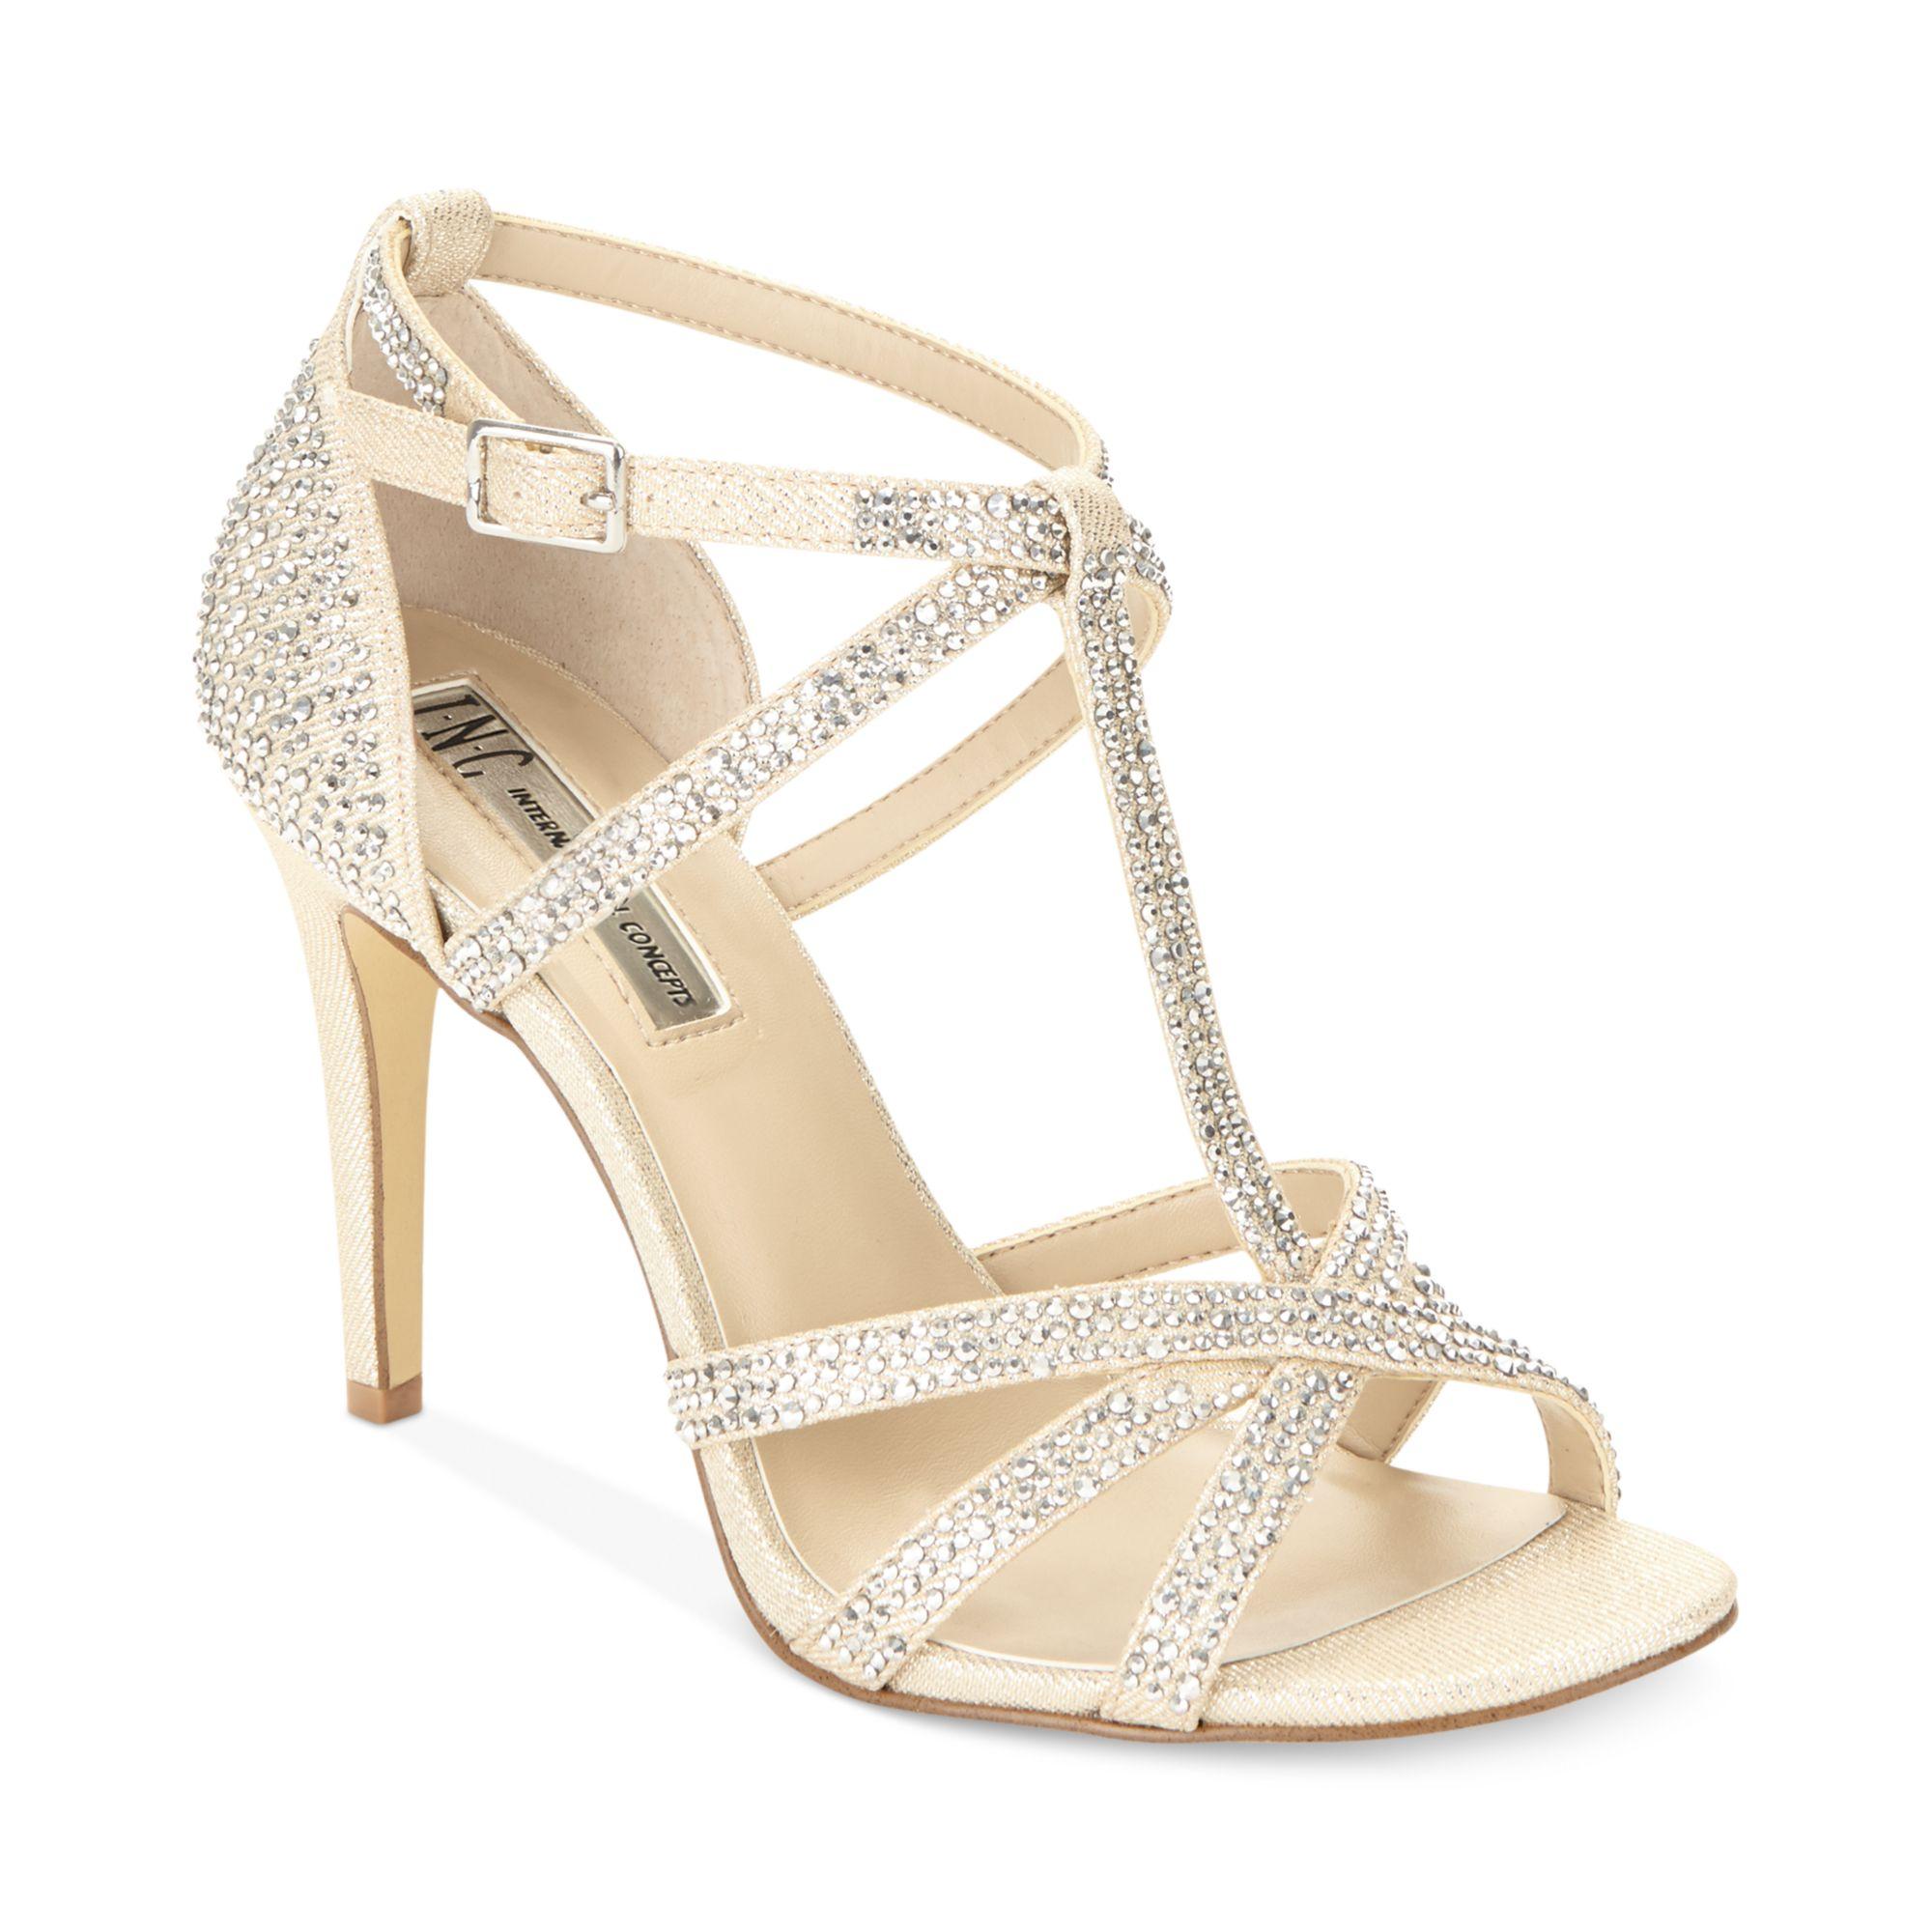 Wedge Heel Shoes At Macy